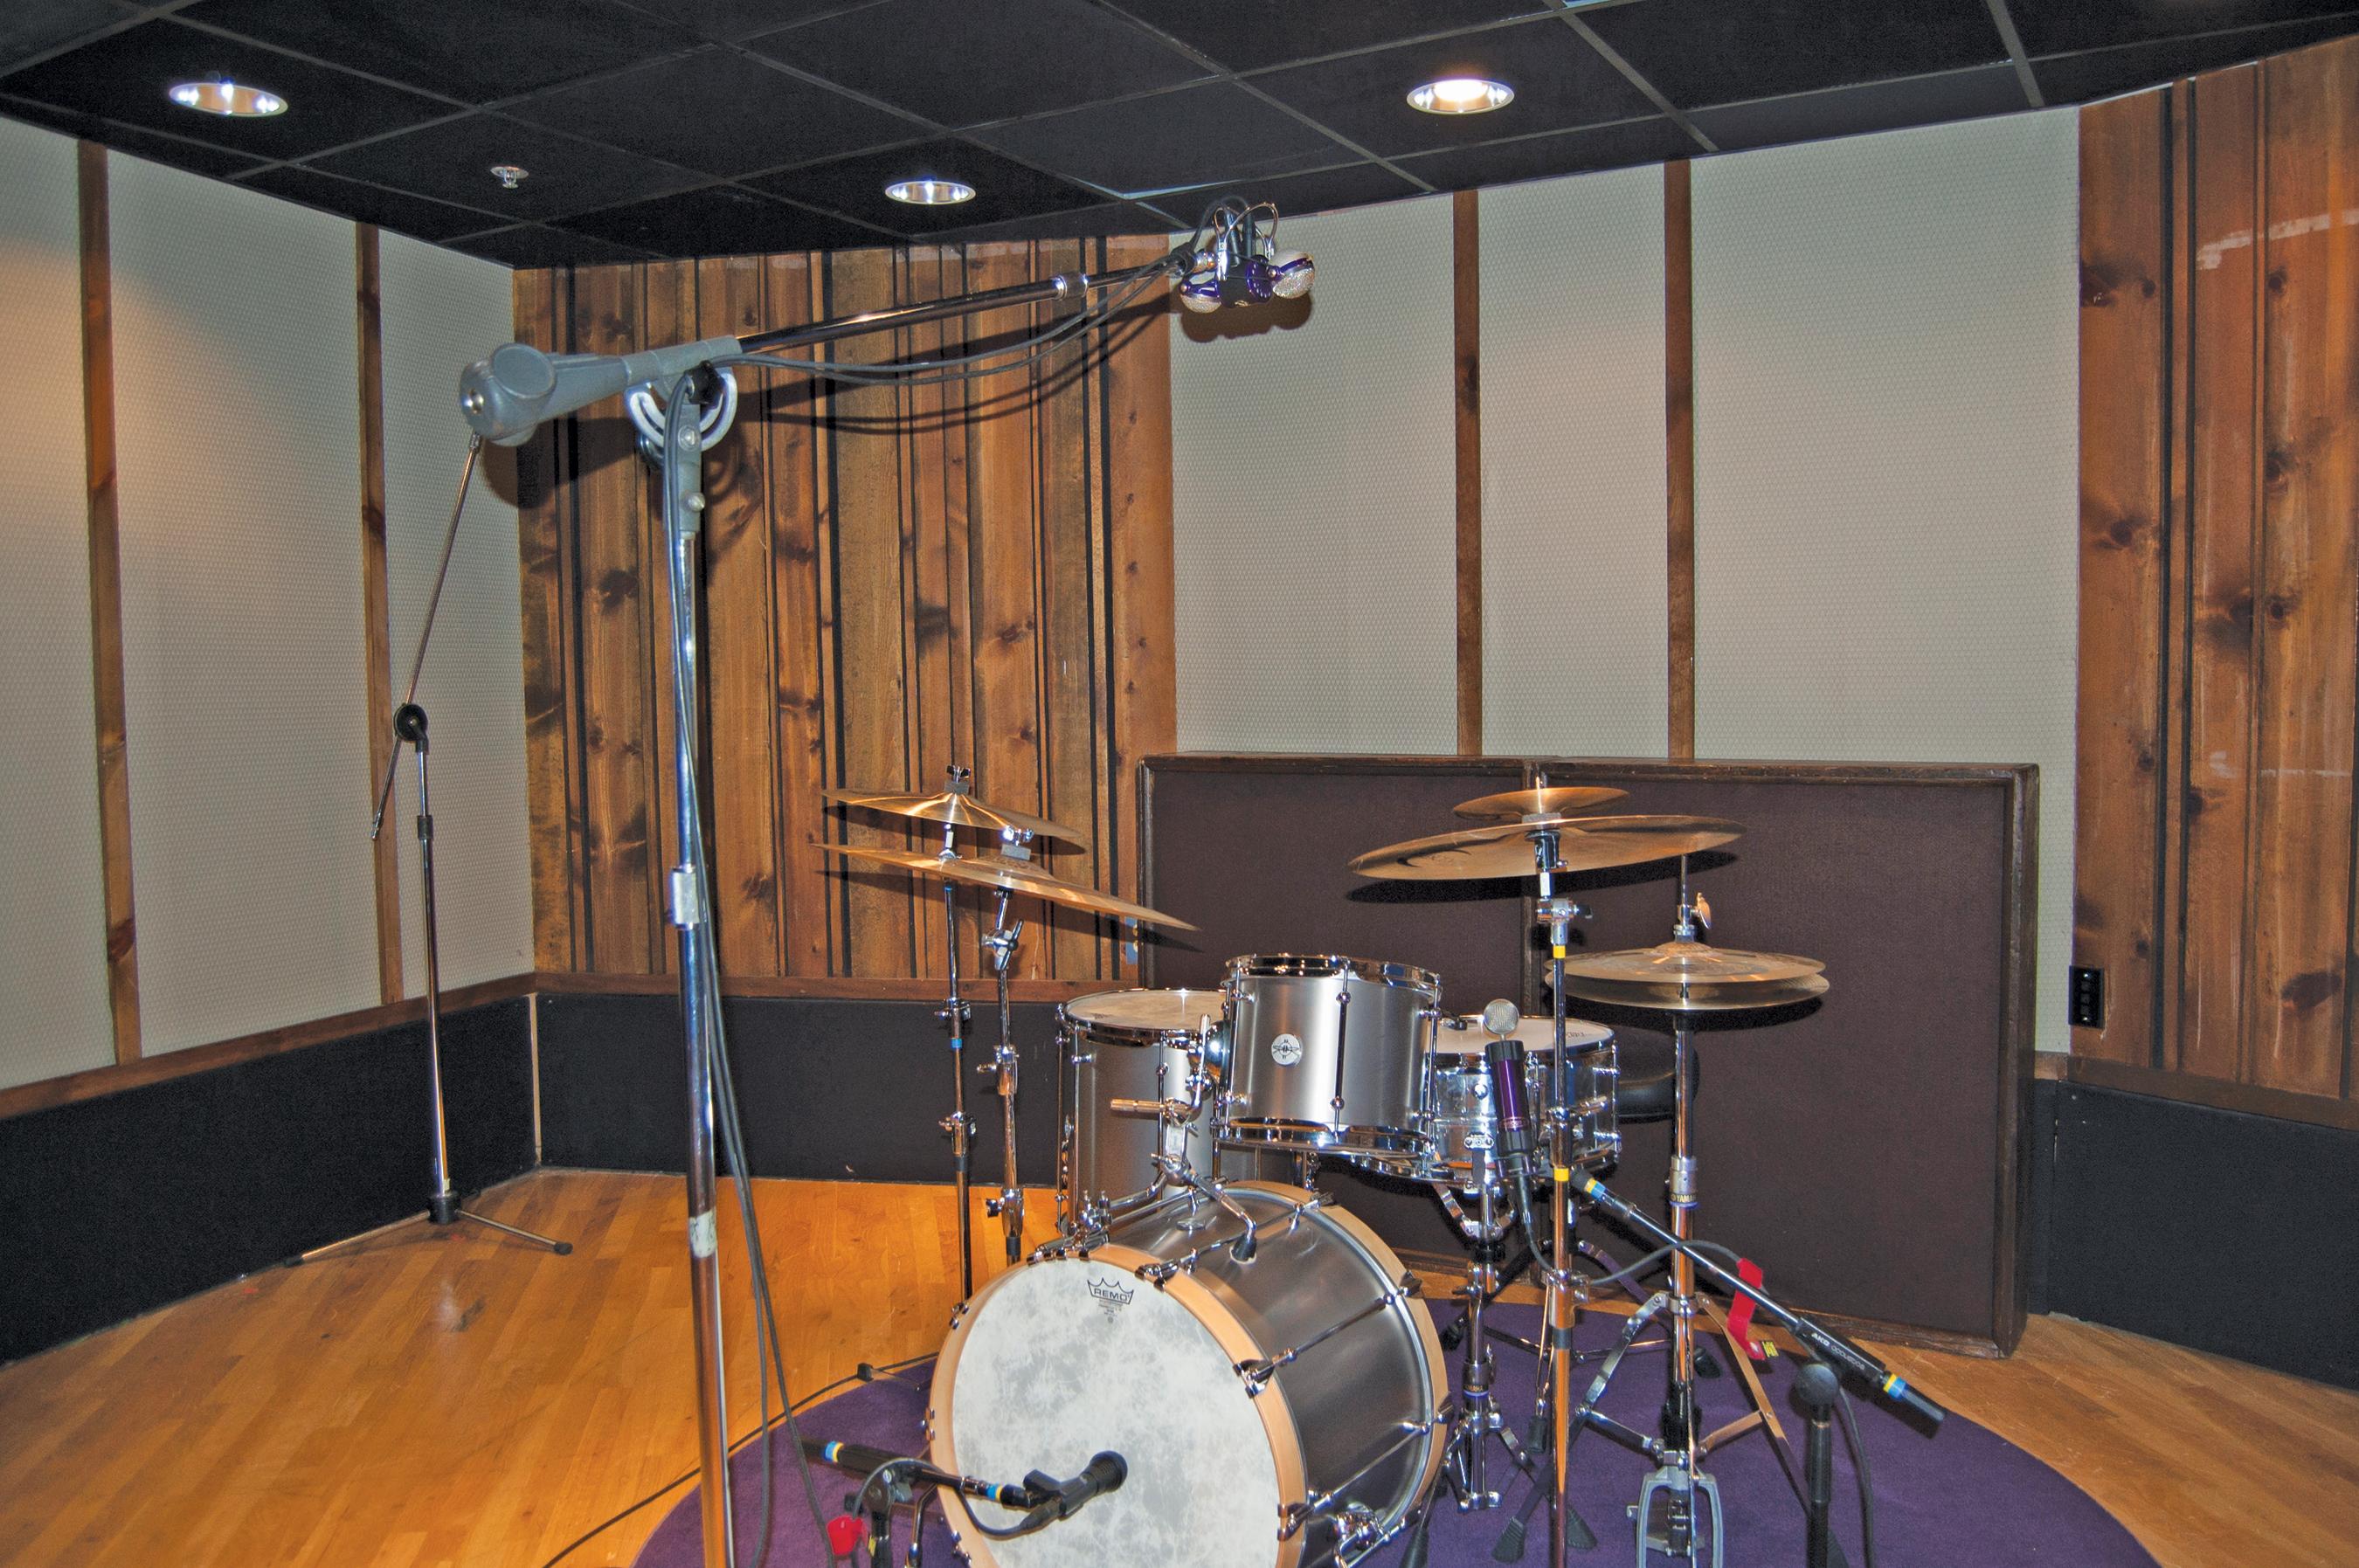 Two Mics Drum Miking Diagram Library Of Wiring Set 101 Part 3 Three Mic Setups Video Modern Drummer Rh Moderndrummer Com Bass Overhead Kit Setup